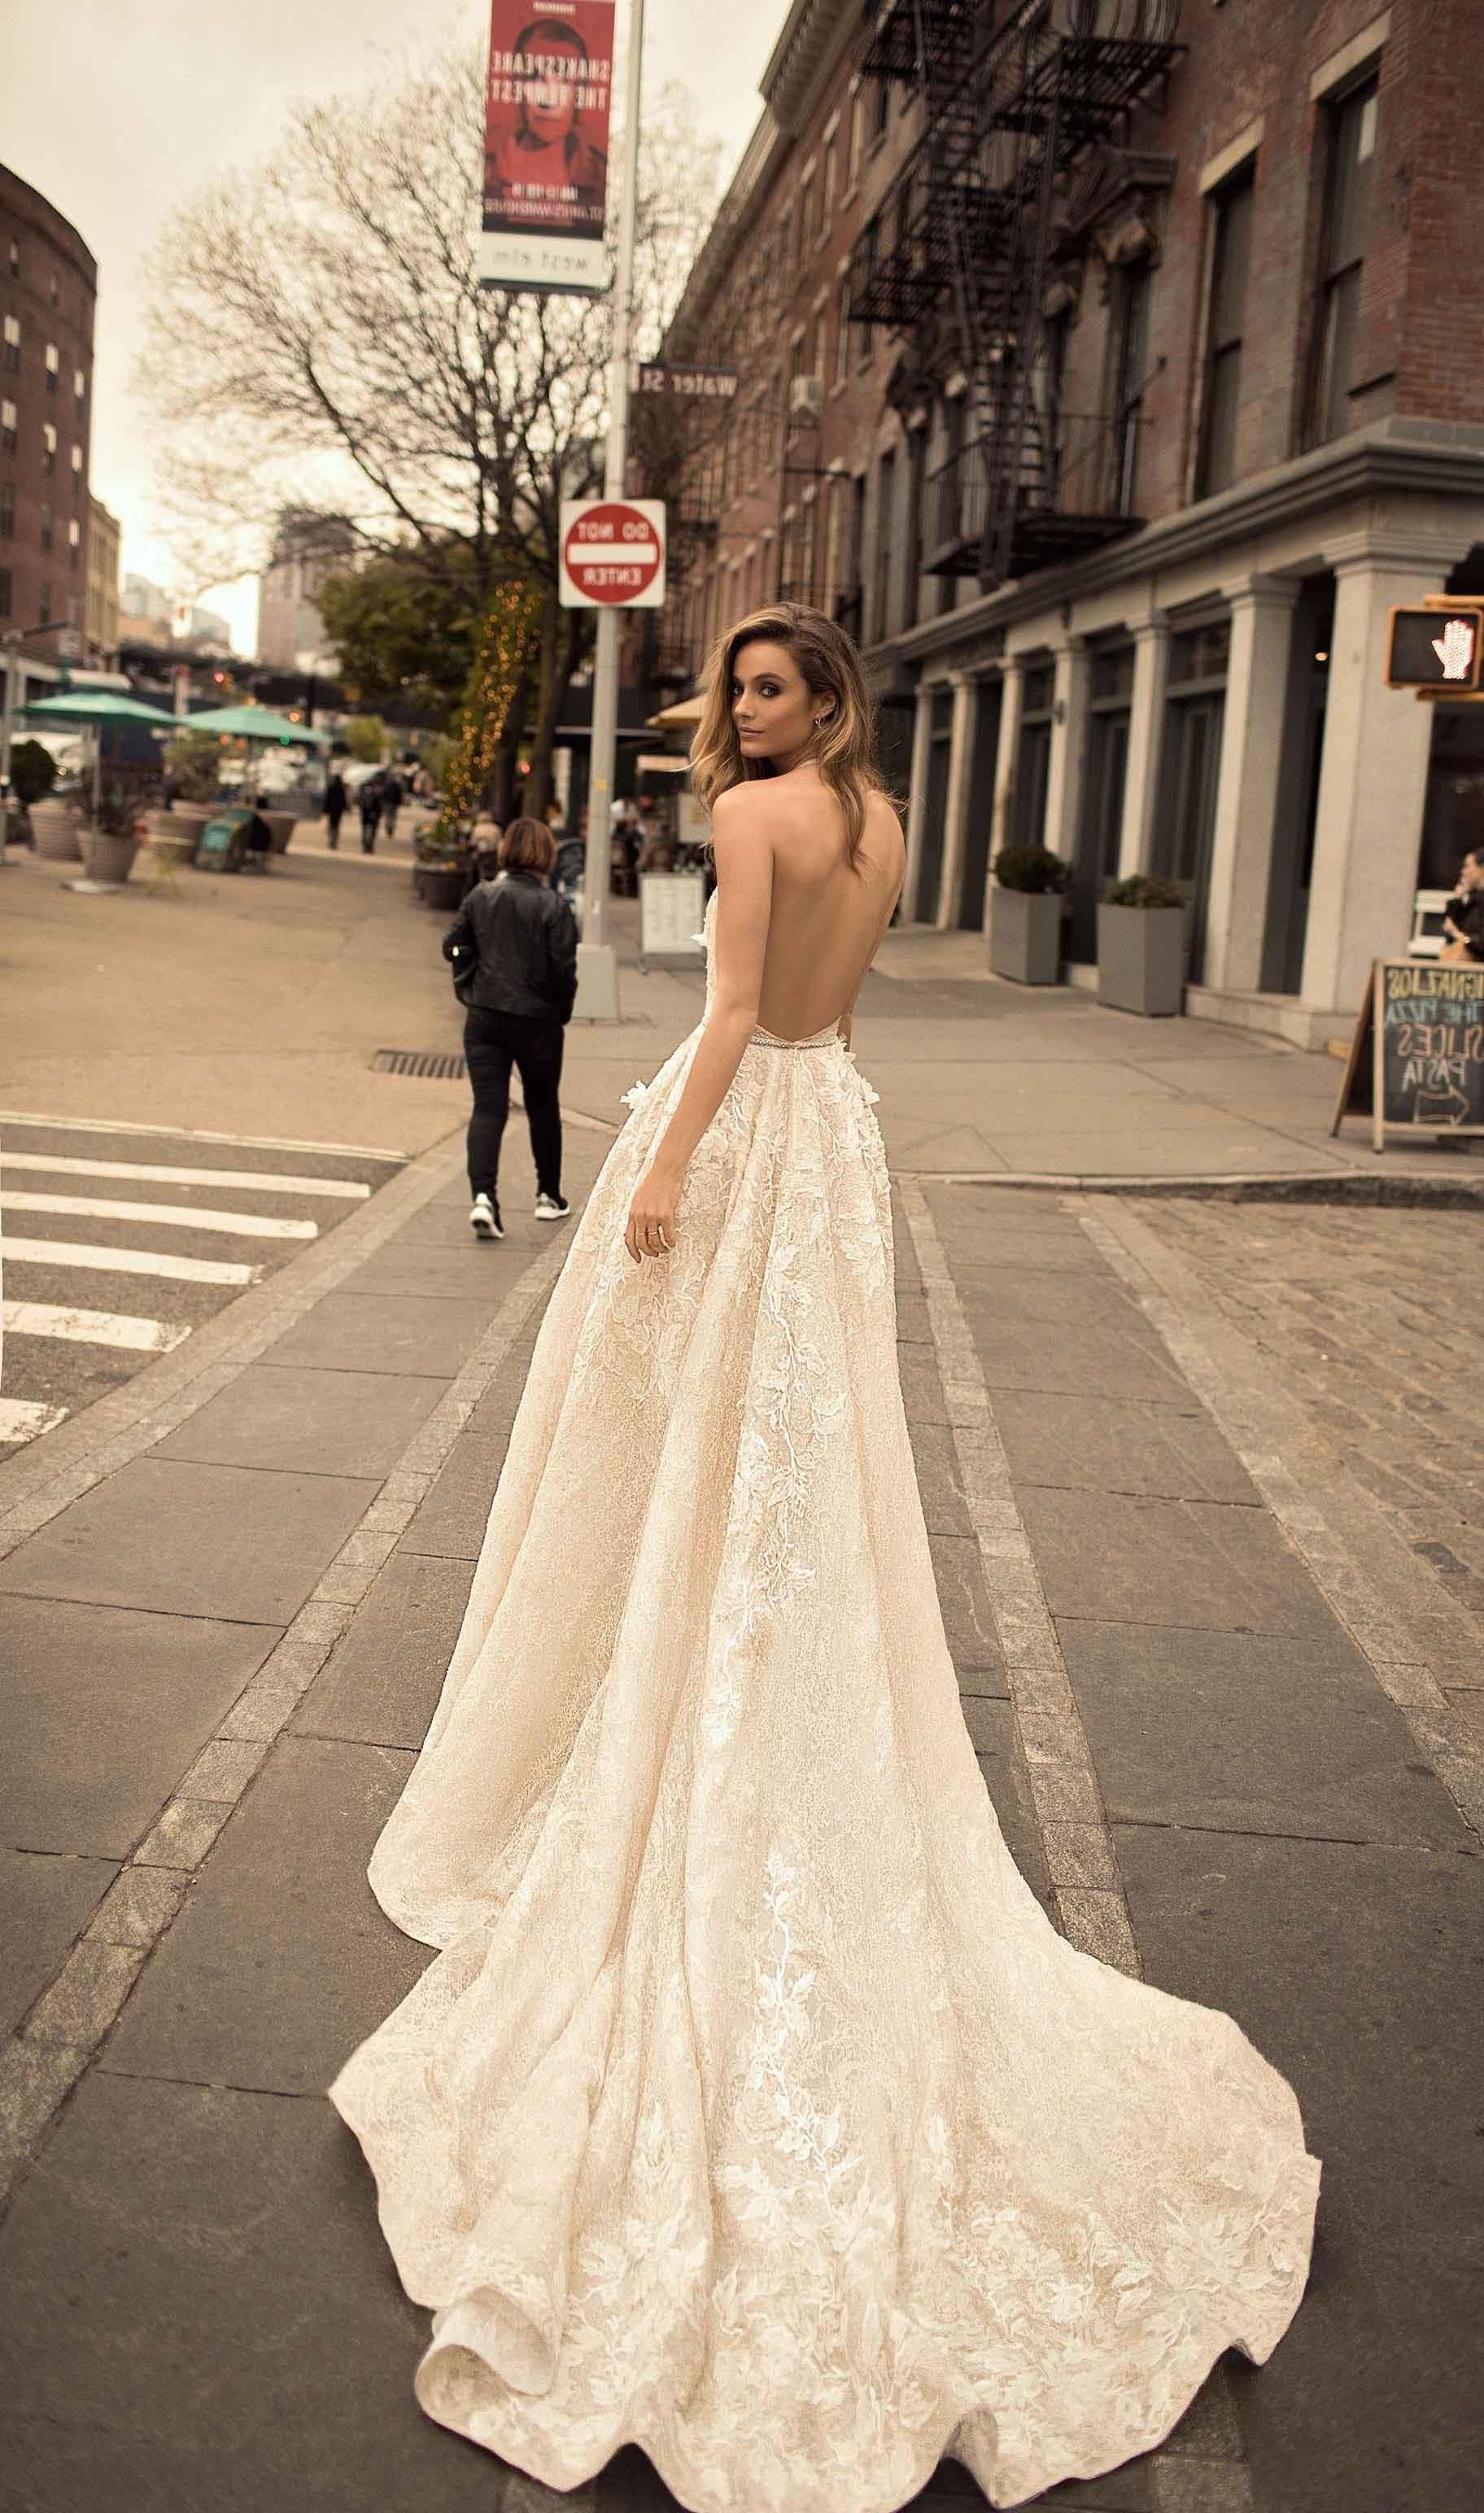 Inspirasi Hijab Bridesmaid Dress Qwdq Wedding Ideas White and Gold Wedding Dress the Newest